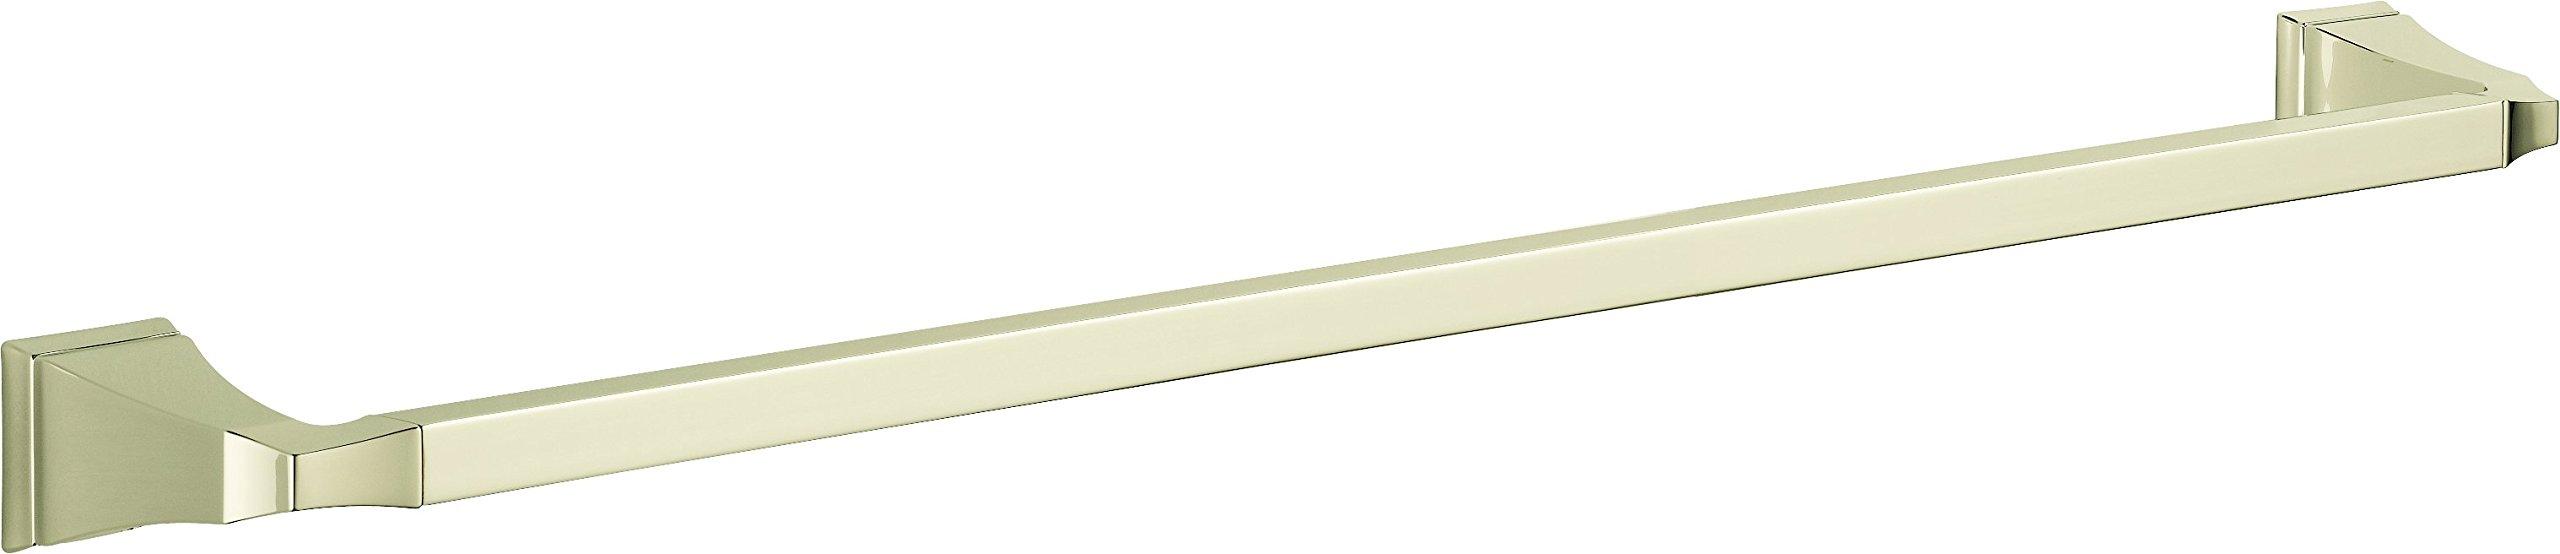 Delta Faucet 75130-PN Dryden Towel Bar, Polished Nickel by DELTA FAUCET